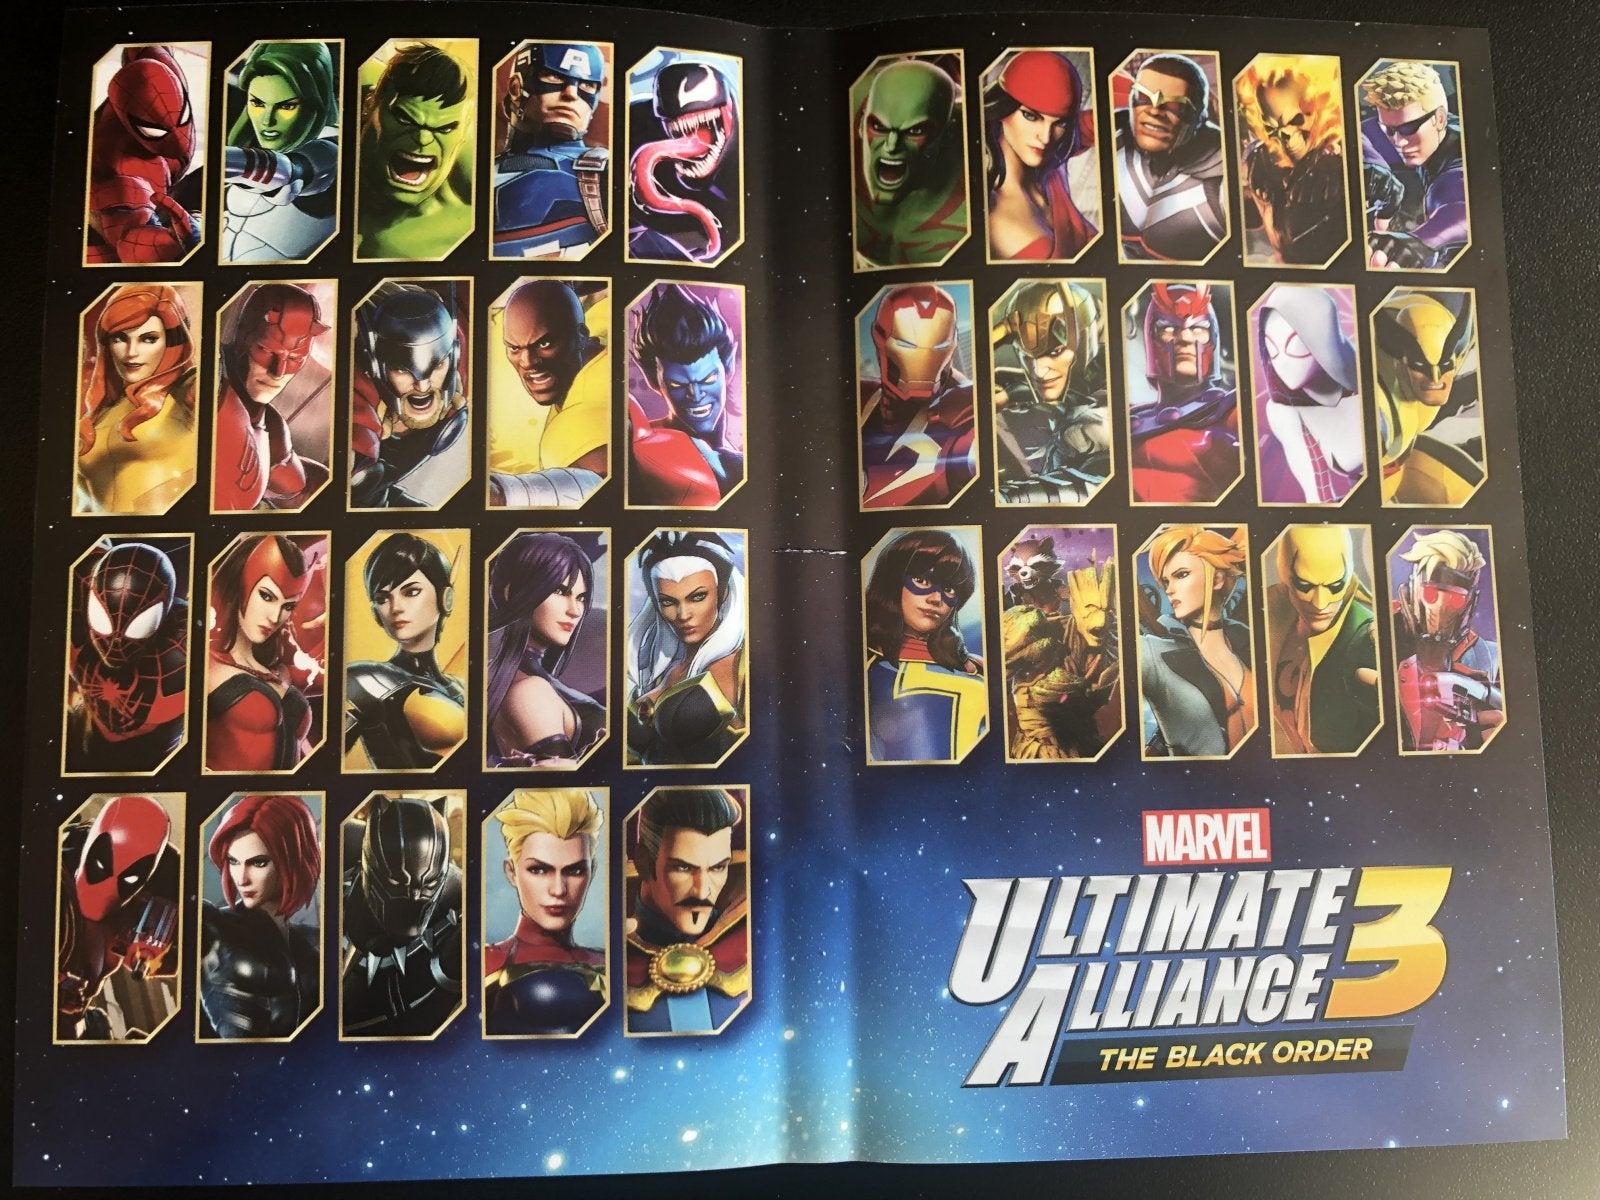 Rumor Marvel Ultimate Alliance 3 Has 2 Unannounced Playable